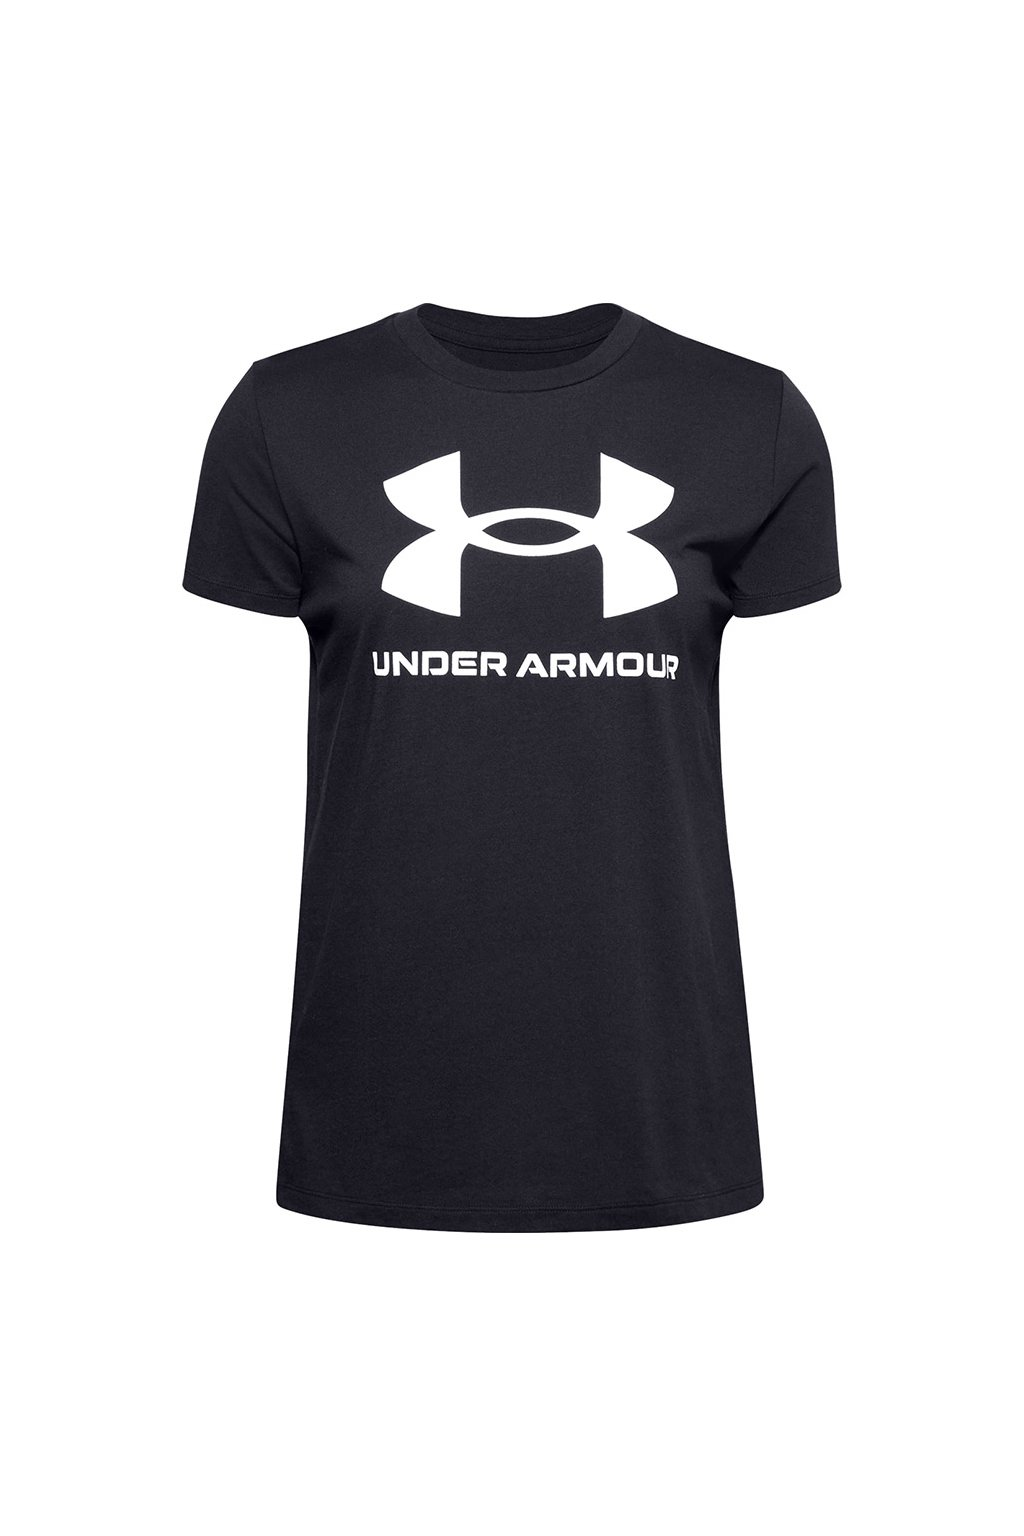 Dámske tričko Under Armour Live Sportstyle Graphic Ssc UAR čierne 1356305 001